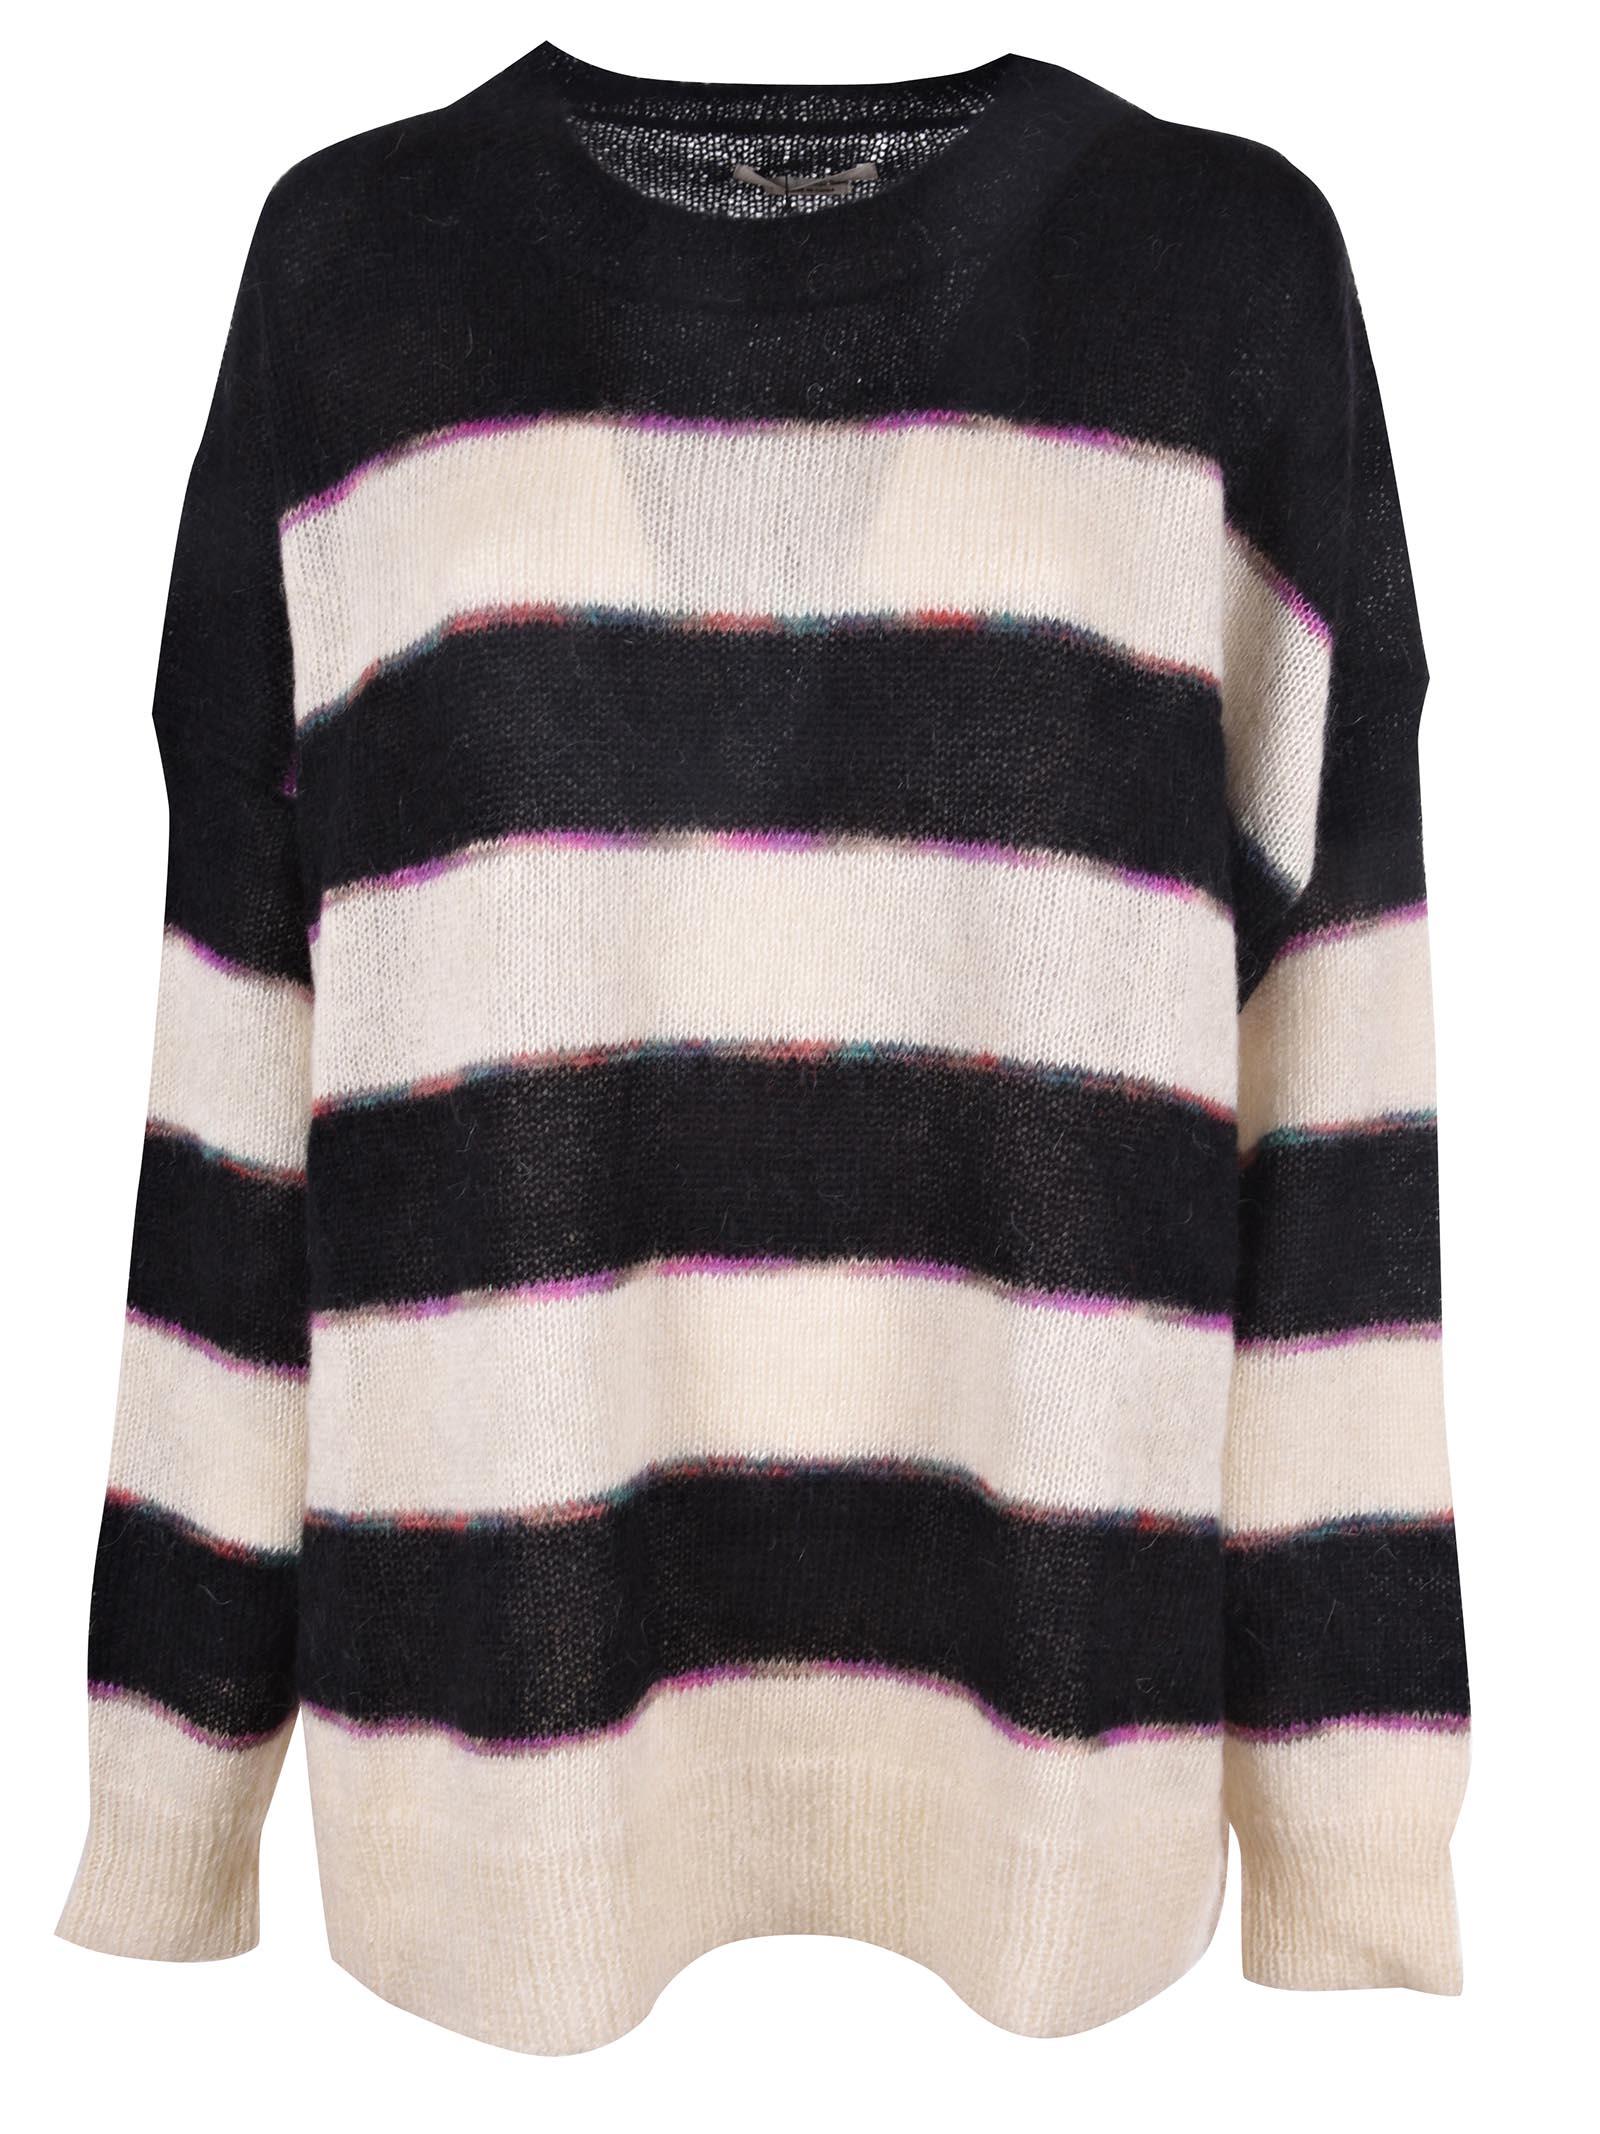 Isabel Etoile Marant Reece Striped Jumper